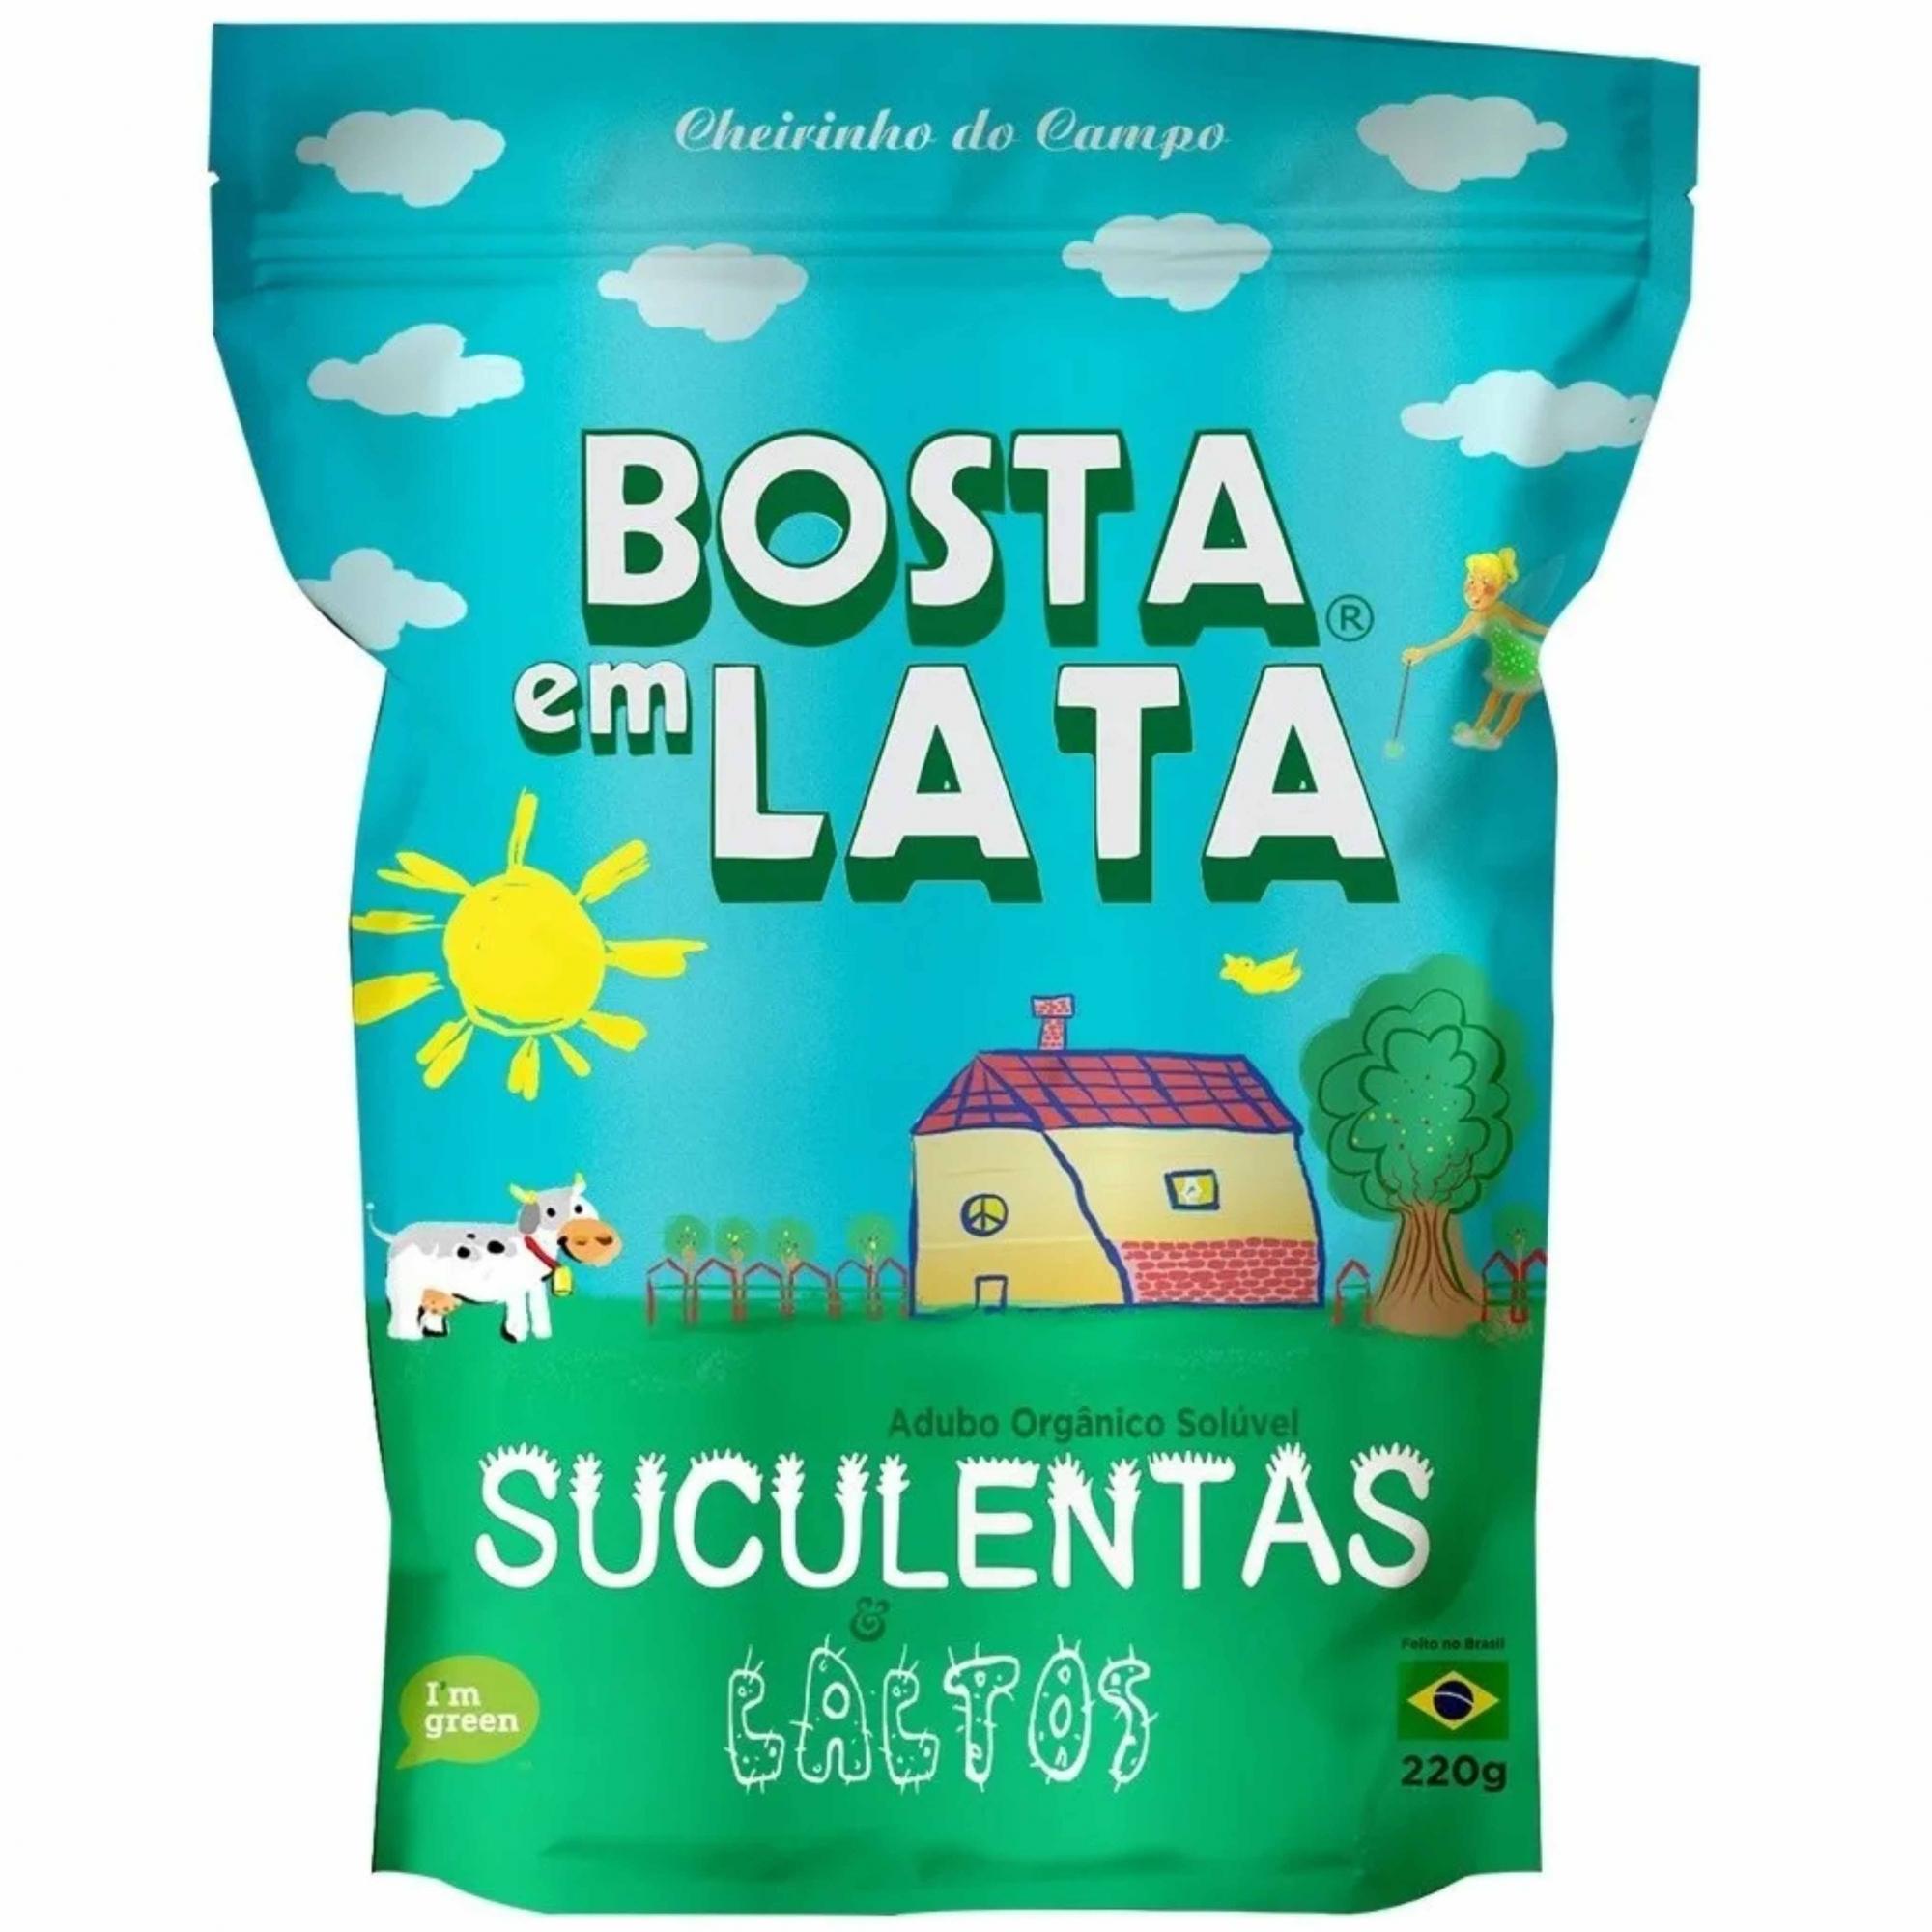 Fertilizante Organico Soluvel Zip p/Suculentas Bosta em Lata 220g